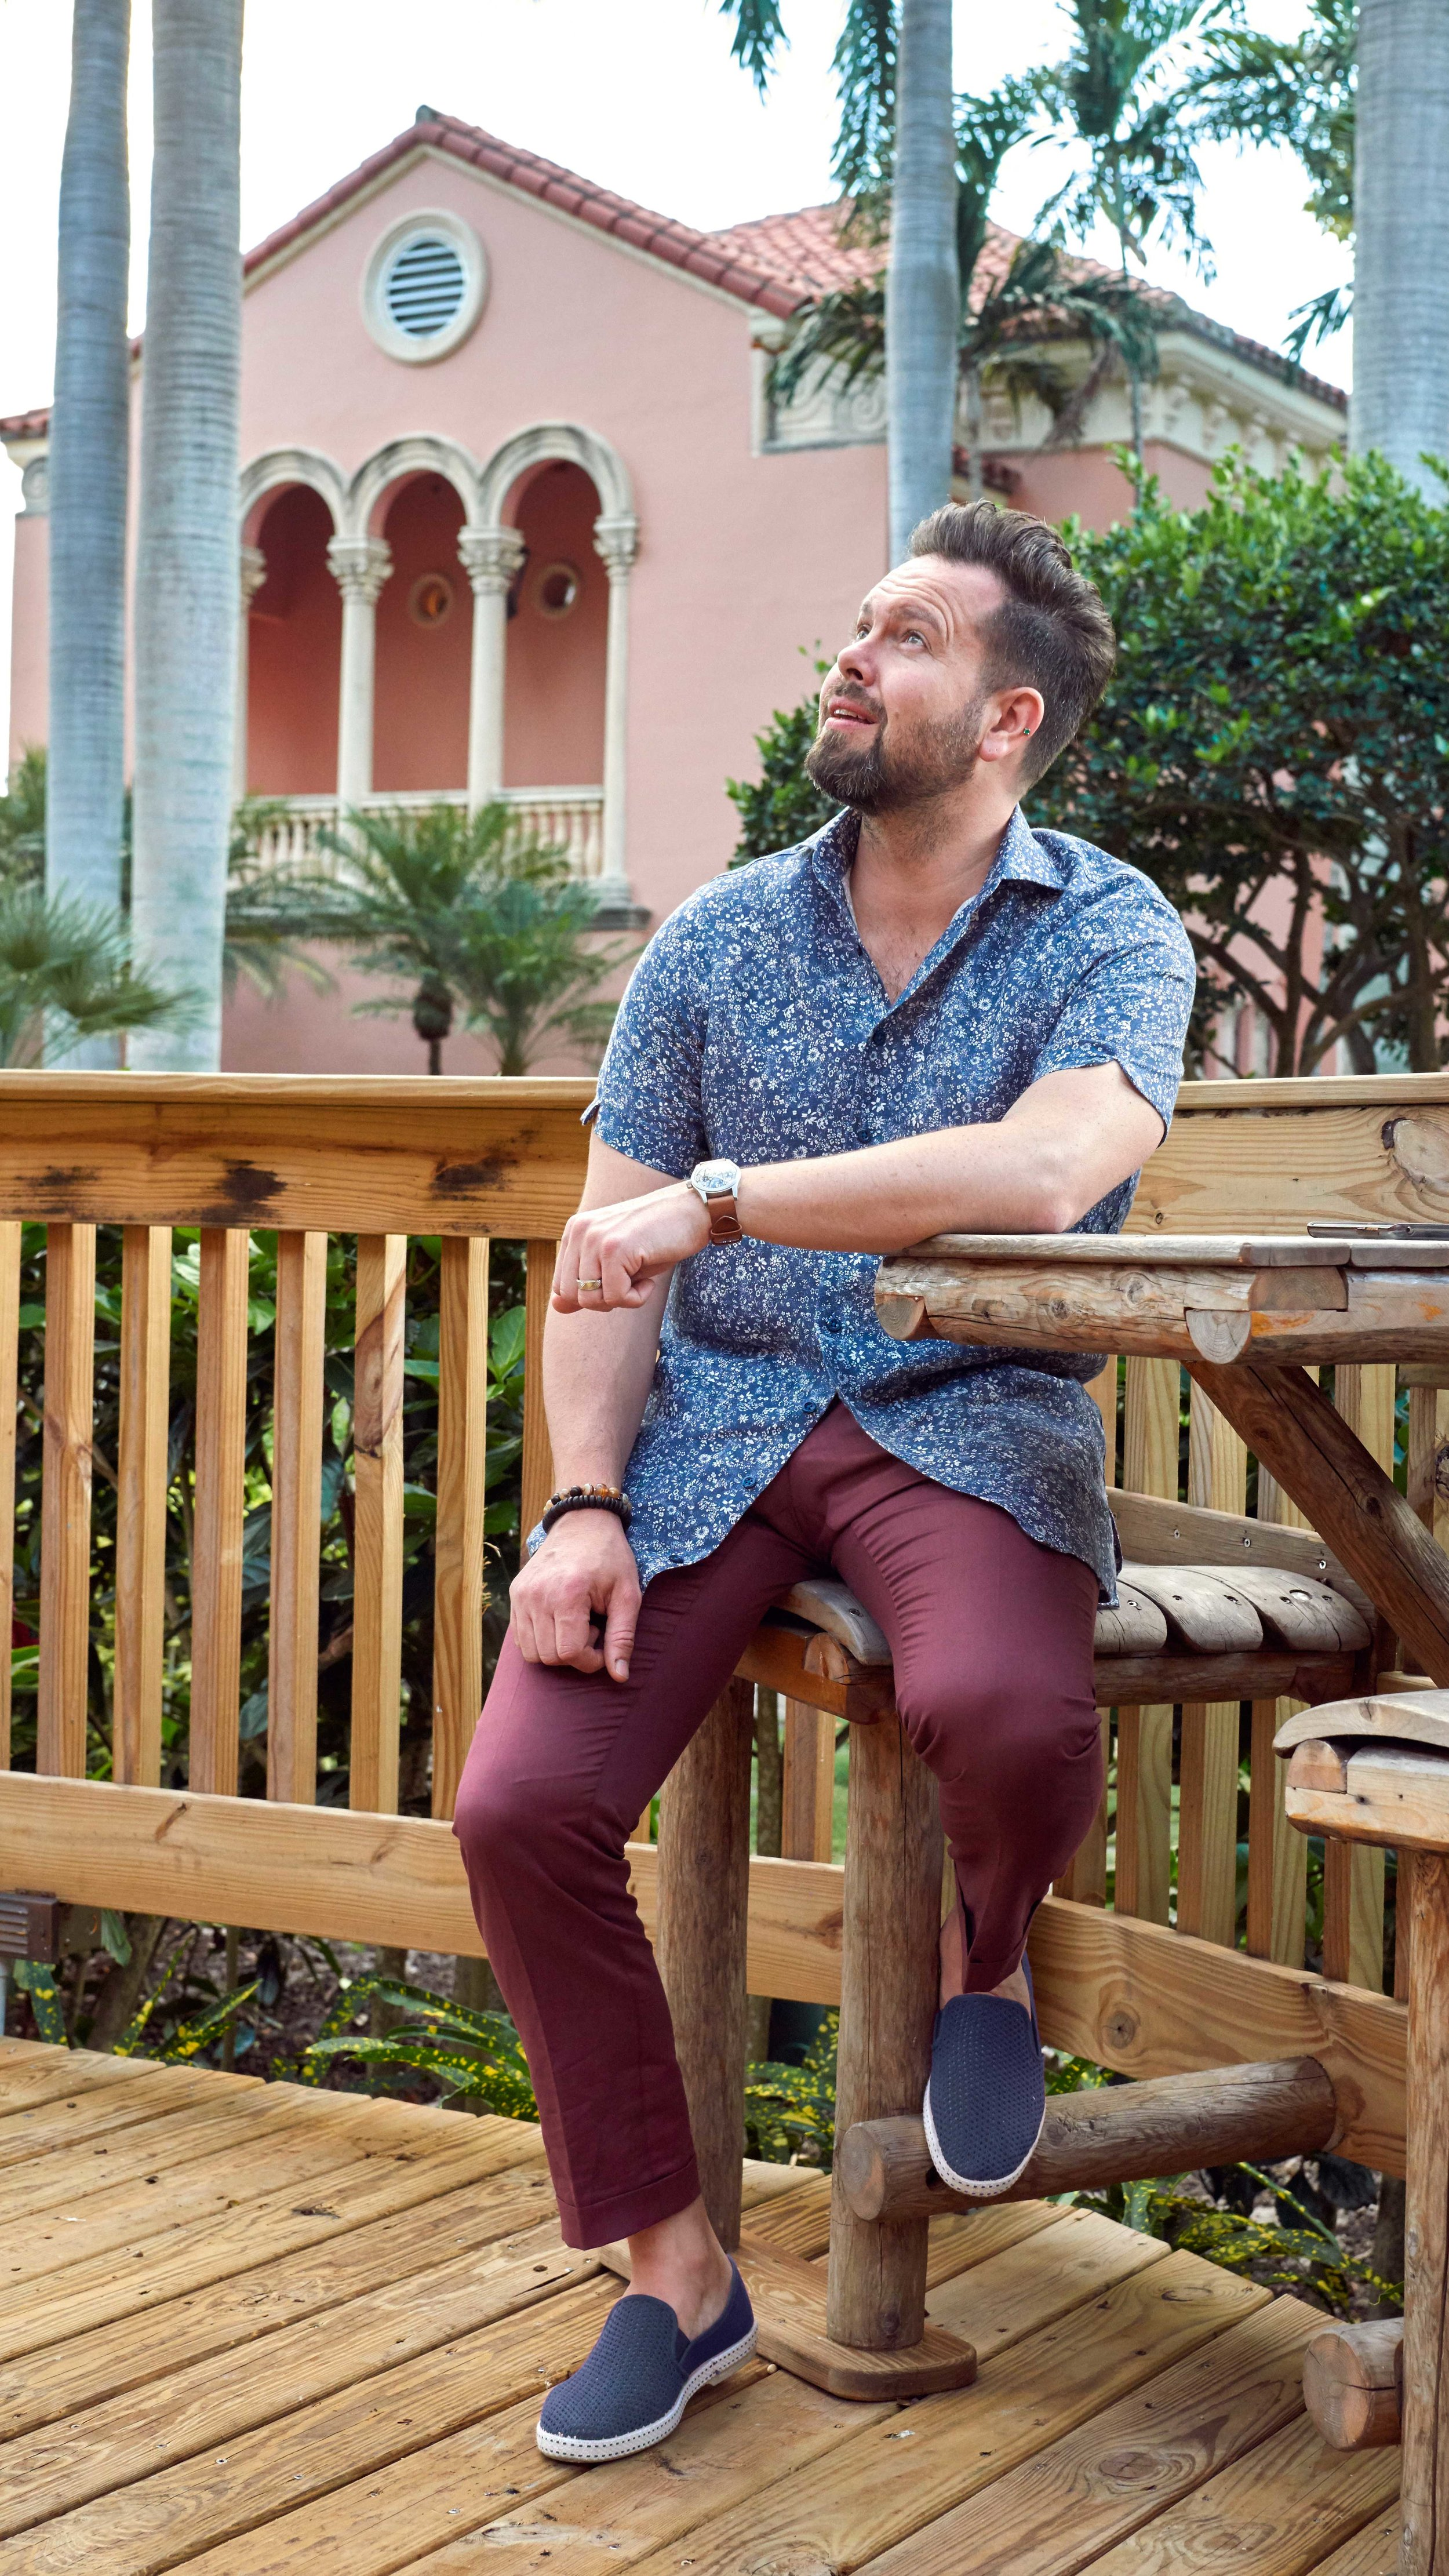 Shirt Cloth :: Thomas Mason, W.P. Chambray Linen No. F357635-19  Made to Measure $365  Bespoke $425  Pant Cloth :: Giordano Basso, Linen/cotton No.04, 260 gm  Made to Measure $875  Bespoke $975